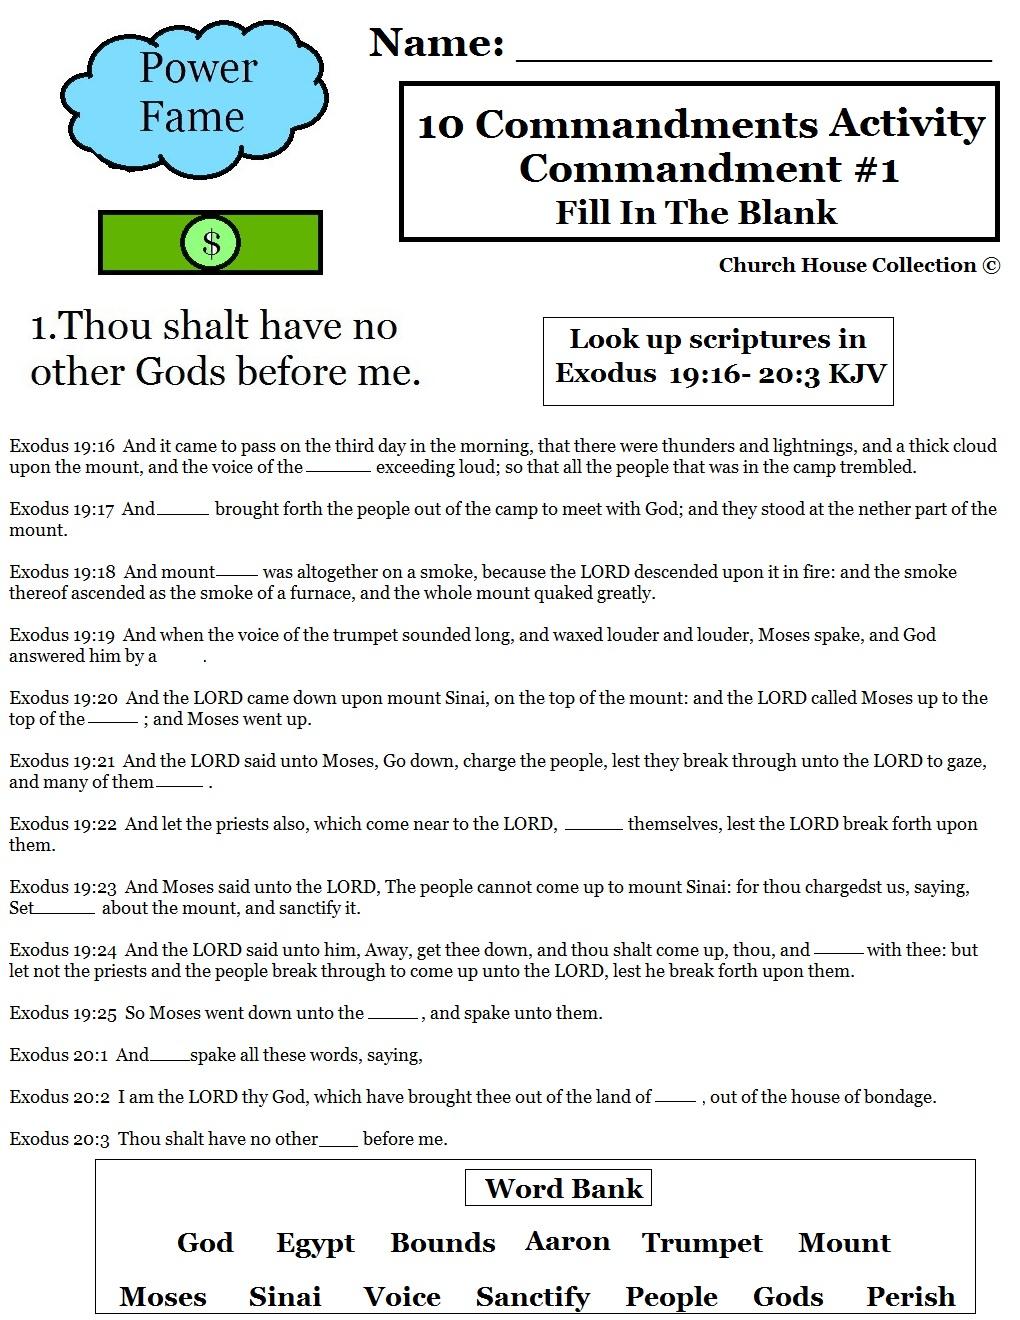 Printables. 10 Commandments Worksheet. Gozoneguide Thousands of  math worksheets, worksheets, free worksheets, education, and grade worksheets Ten Commandments Worksheets For Kids 1320 x 1020